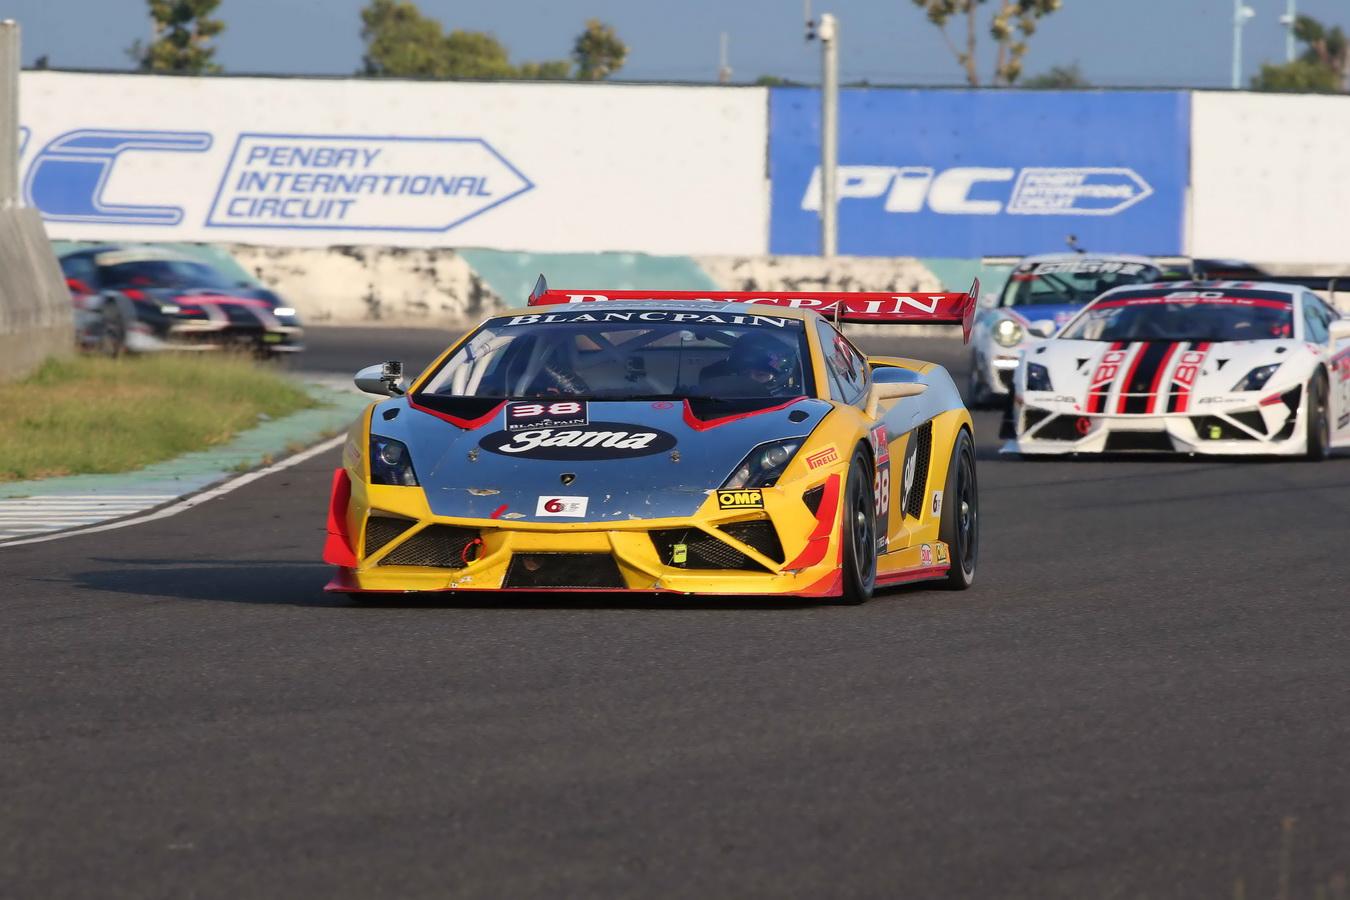 蠻牛 Lamborghini Gallardo衝進2013 Asian Le Mans 延續Super Trofeo Asia成功氣焰!